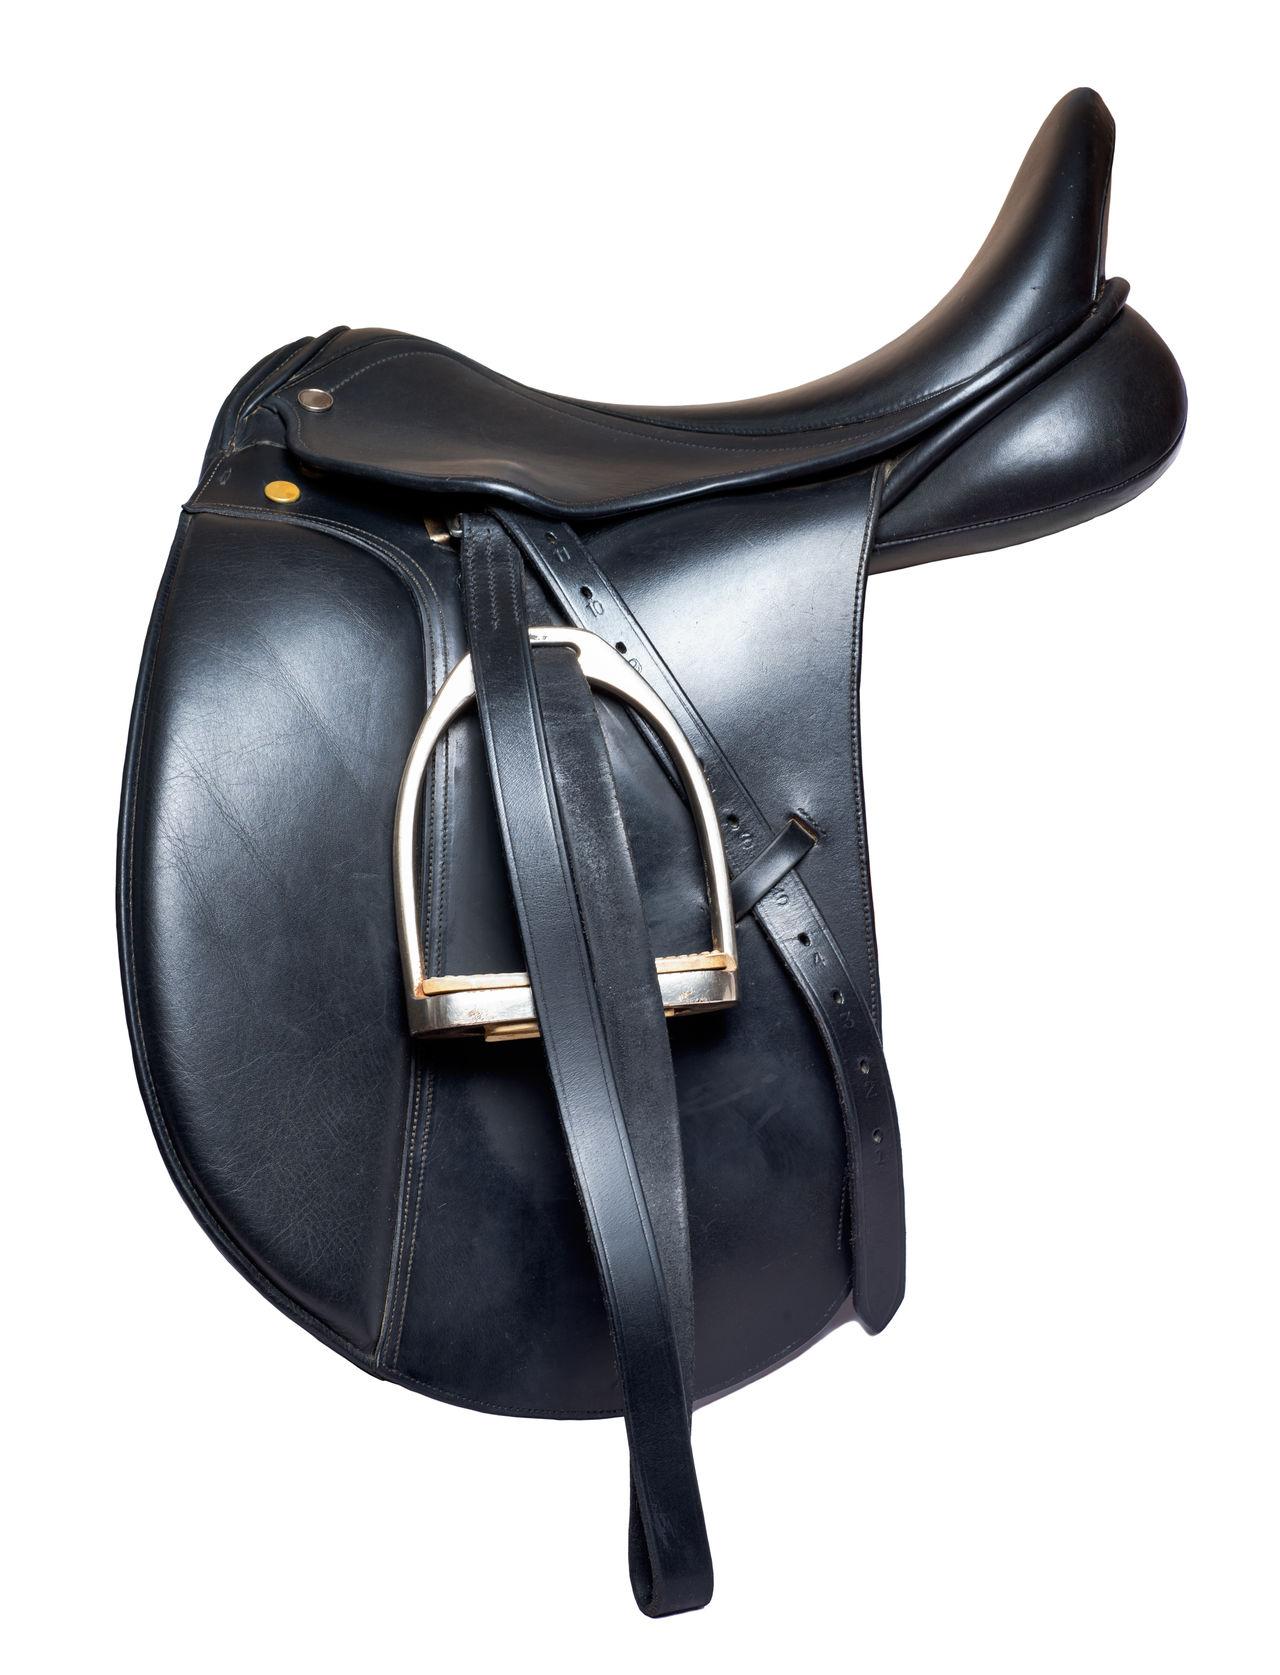 Black Color Close-up Dressage Fashion Horse Lether No People Professional Saddle Seat Stirrup Studio Shot White Background